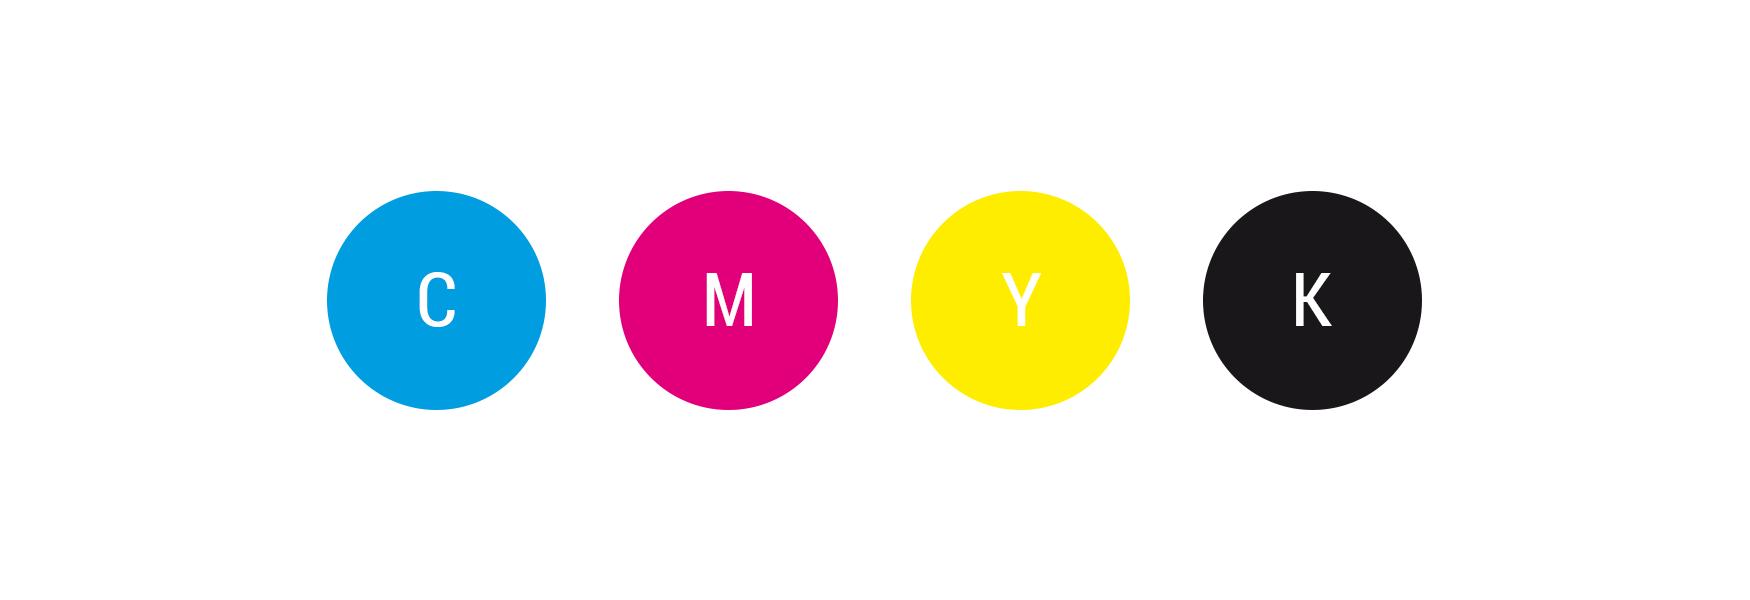 Designagentur-Stuttgart-Kreativbetrieb-Design-Lexikon-CMYK-1